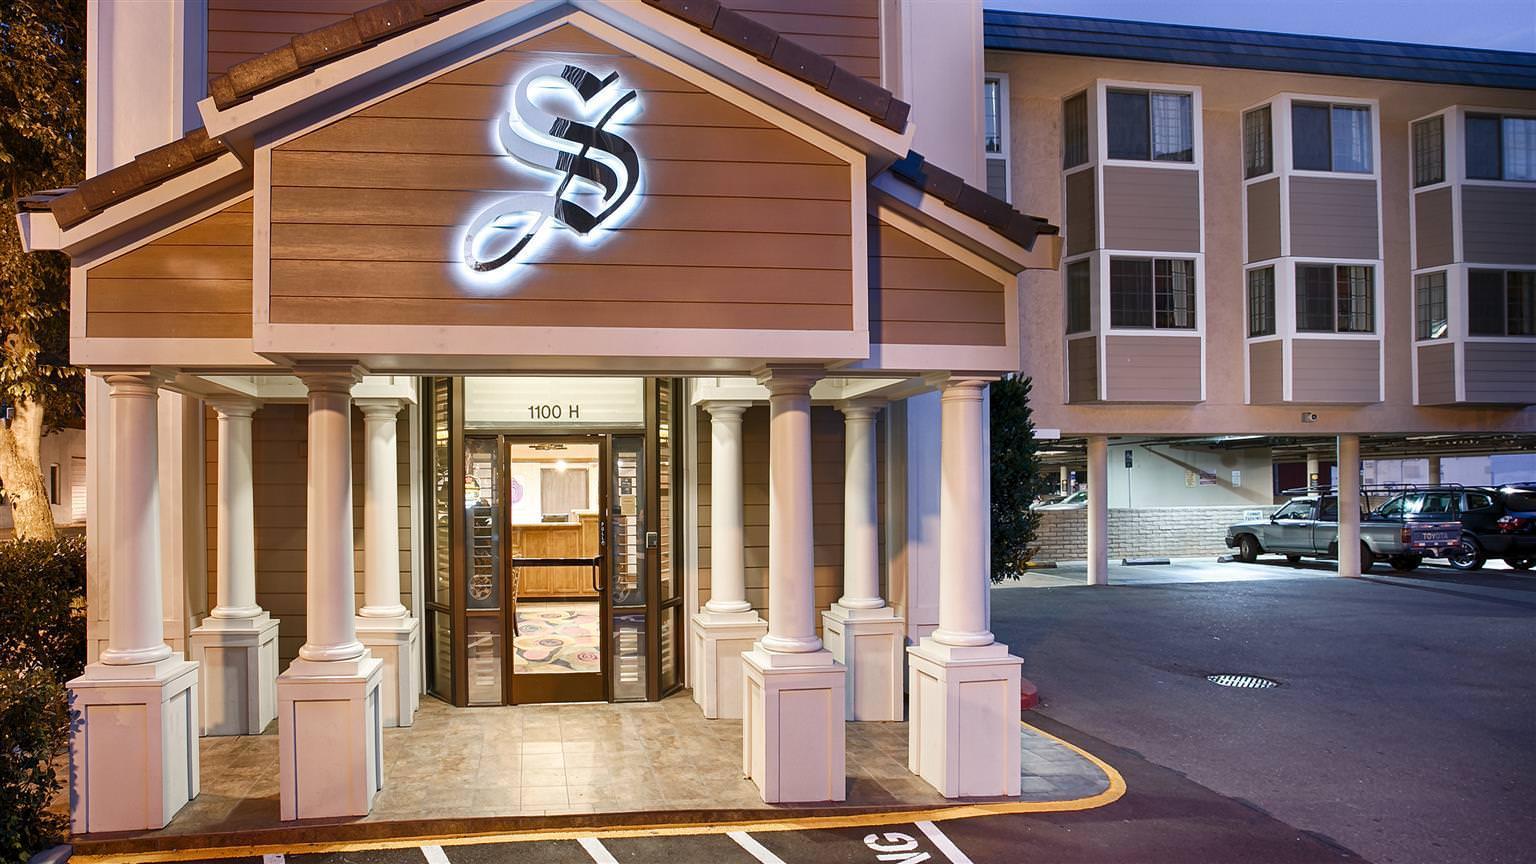 Ultimate List of Best Luxury Hotels in California, Best Western PLUS Sutter House